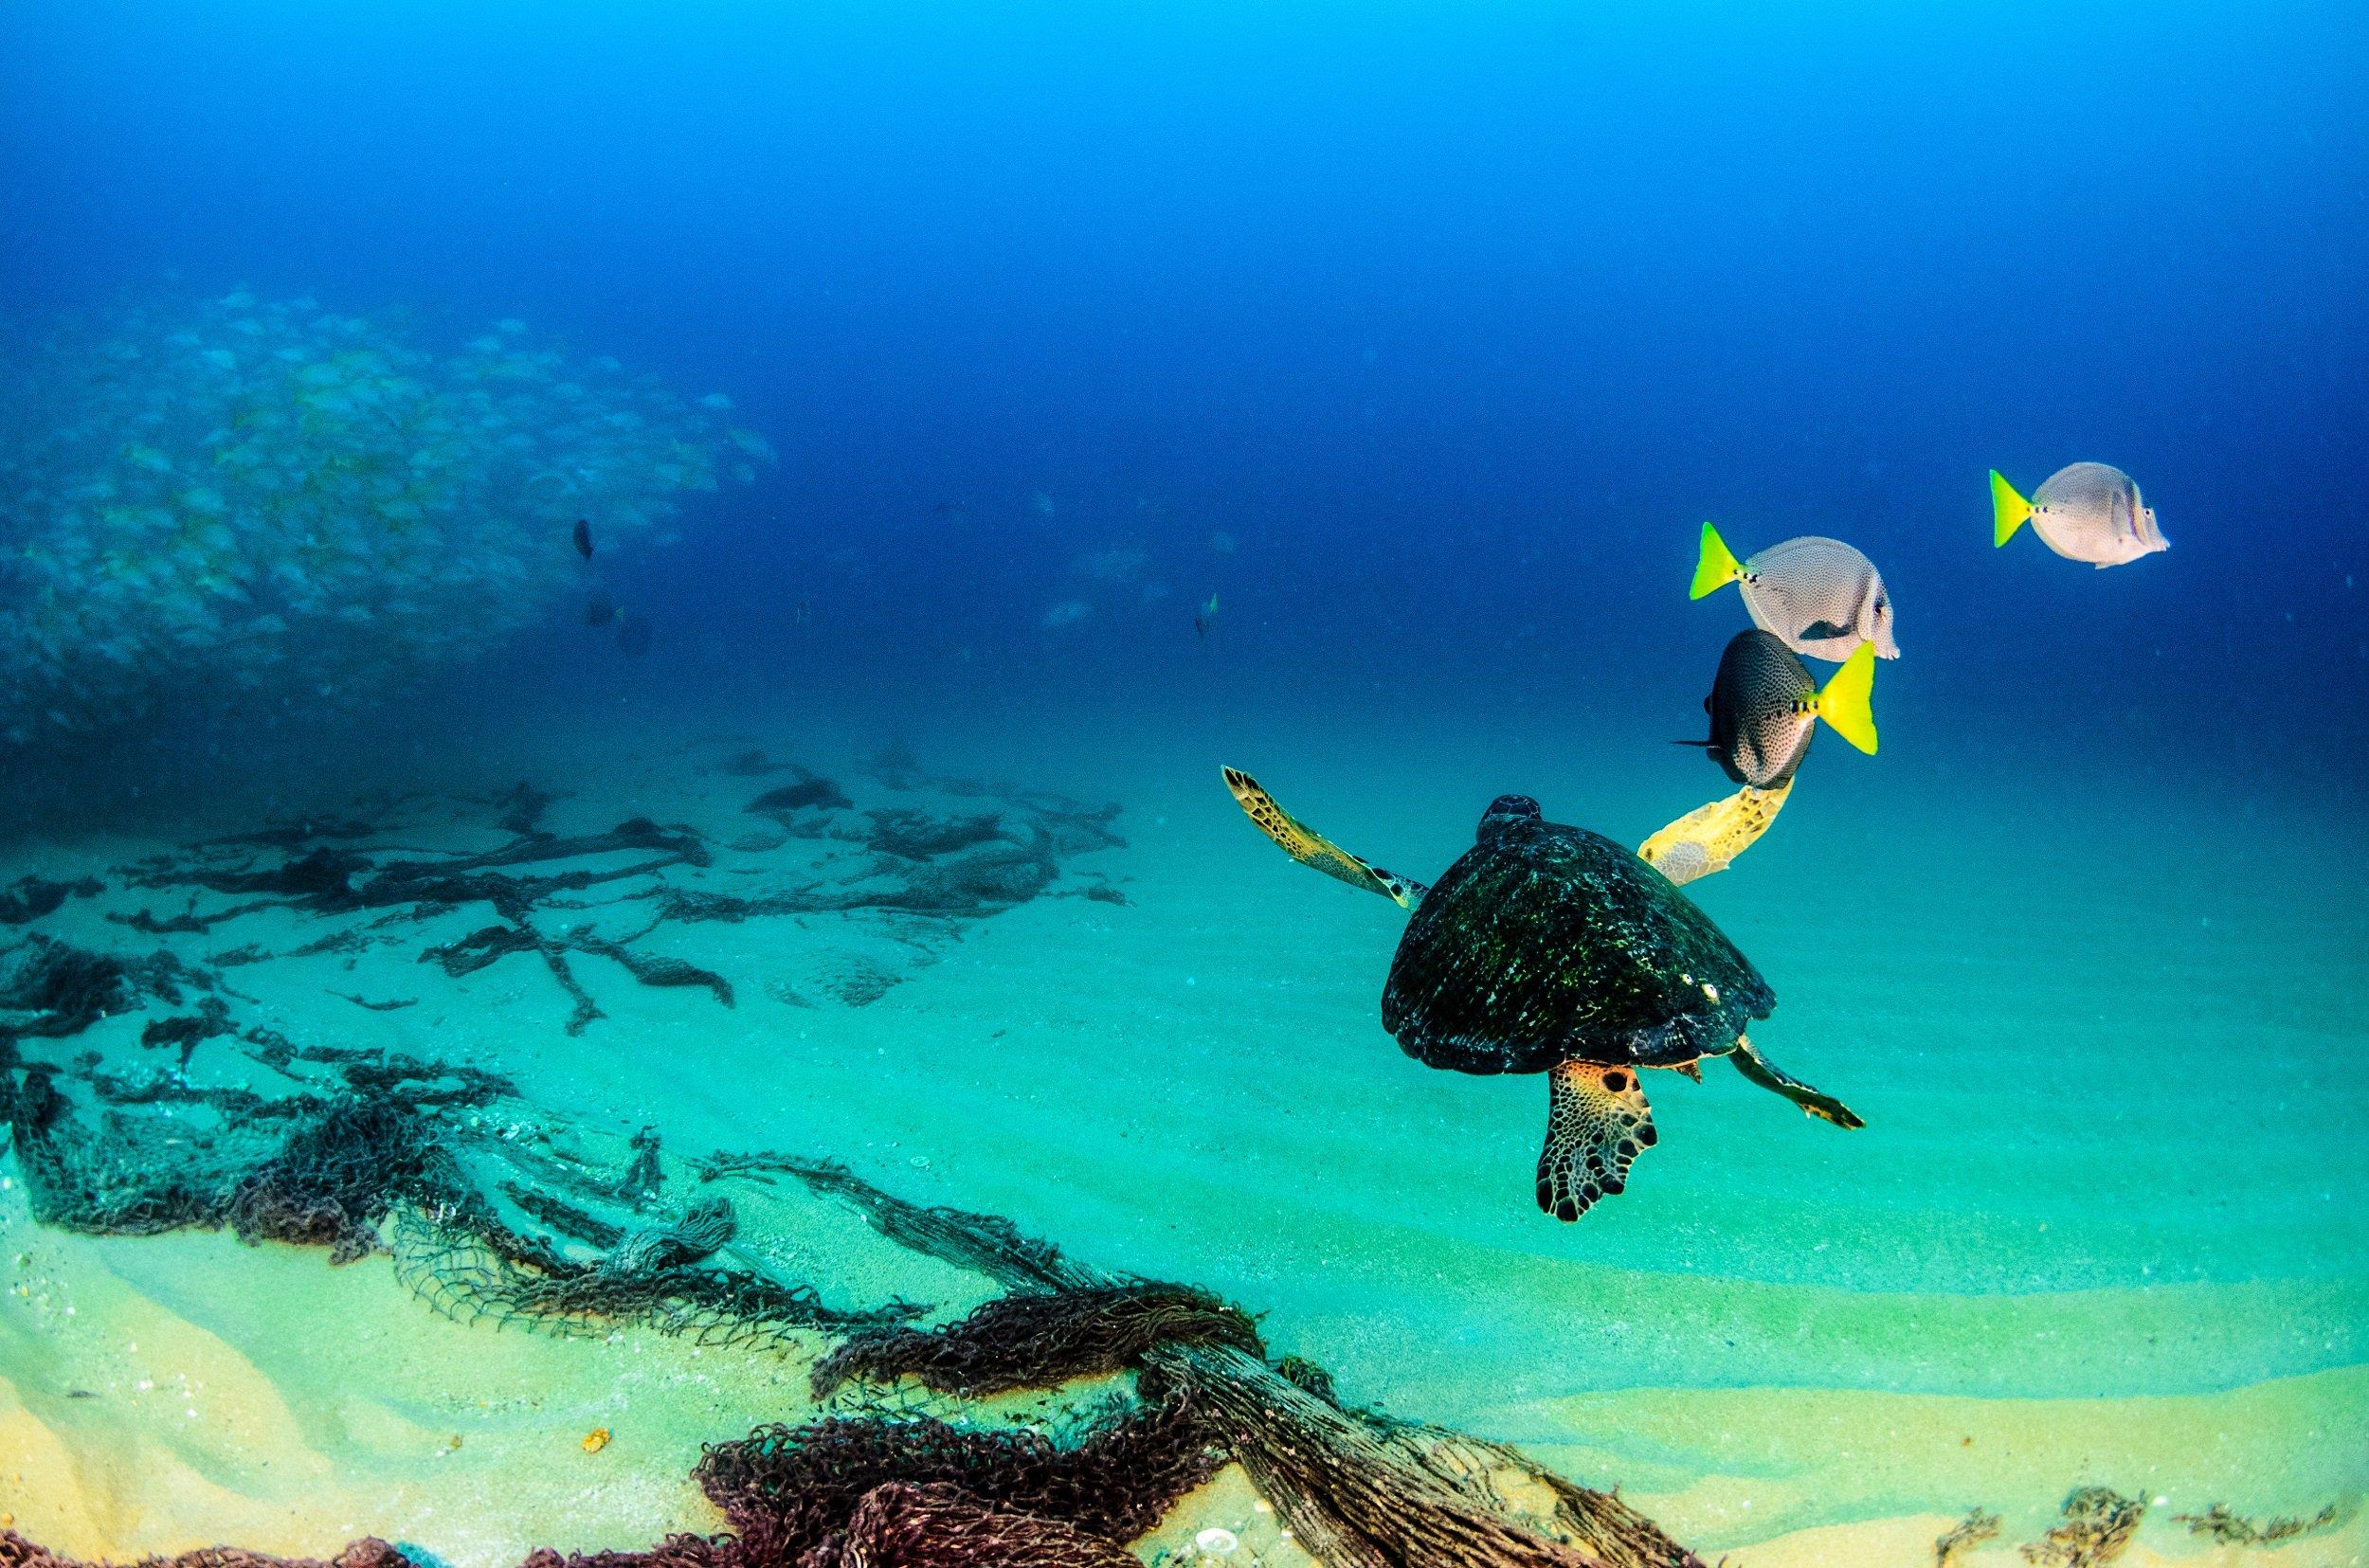 Sea Of Cortez Catamaran & Snorkeling Tour From Los Cabos